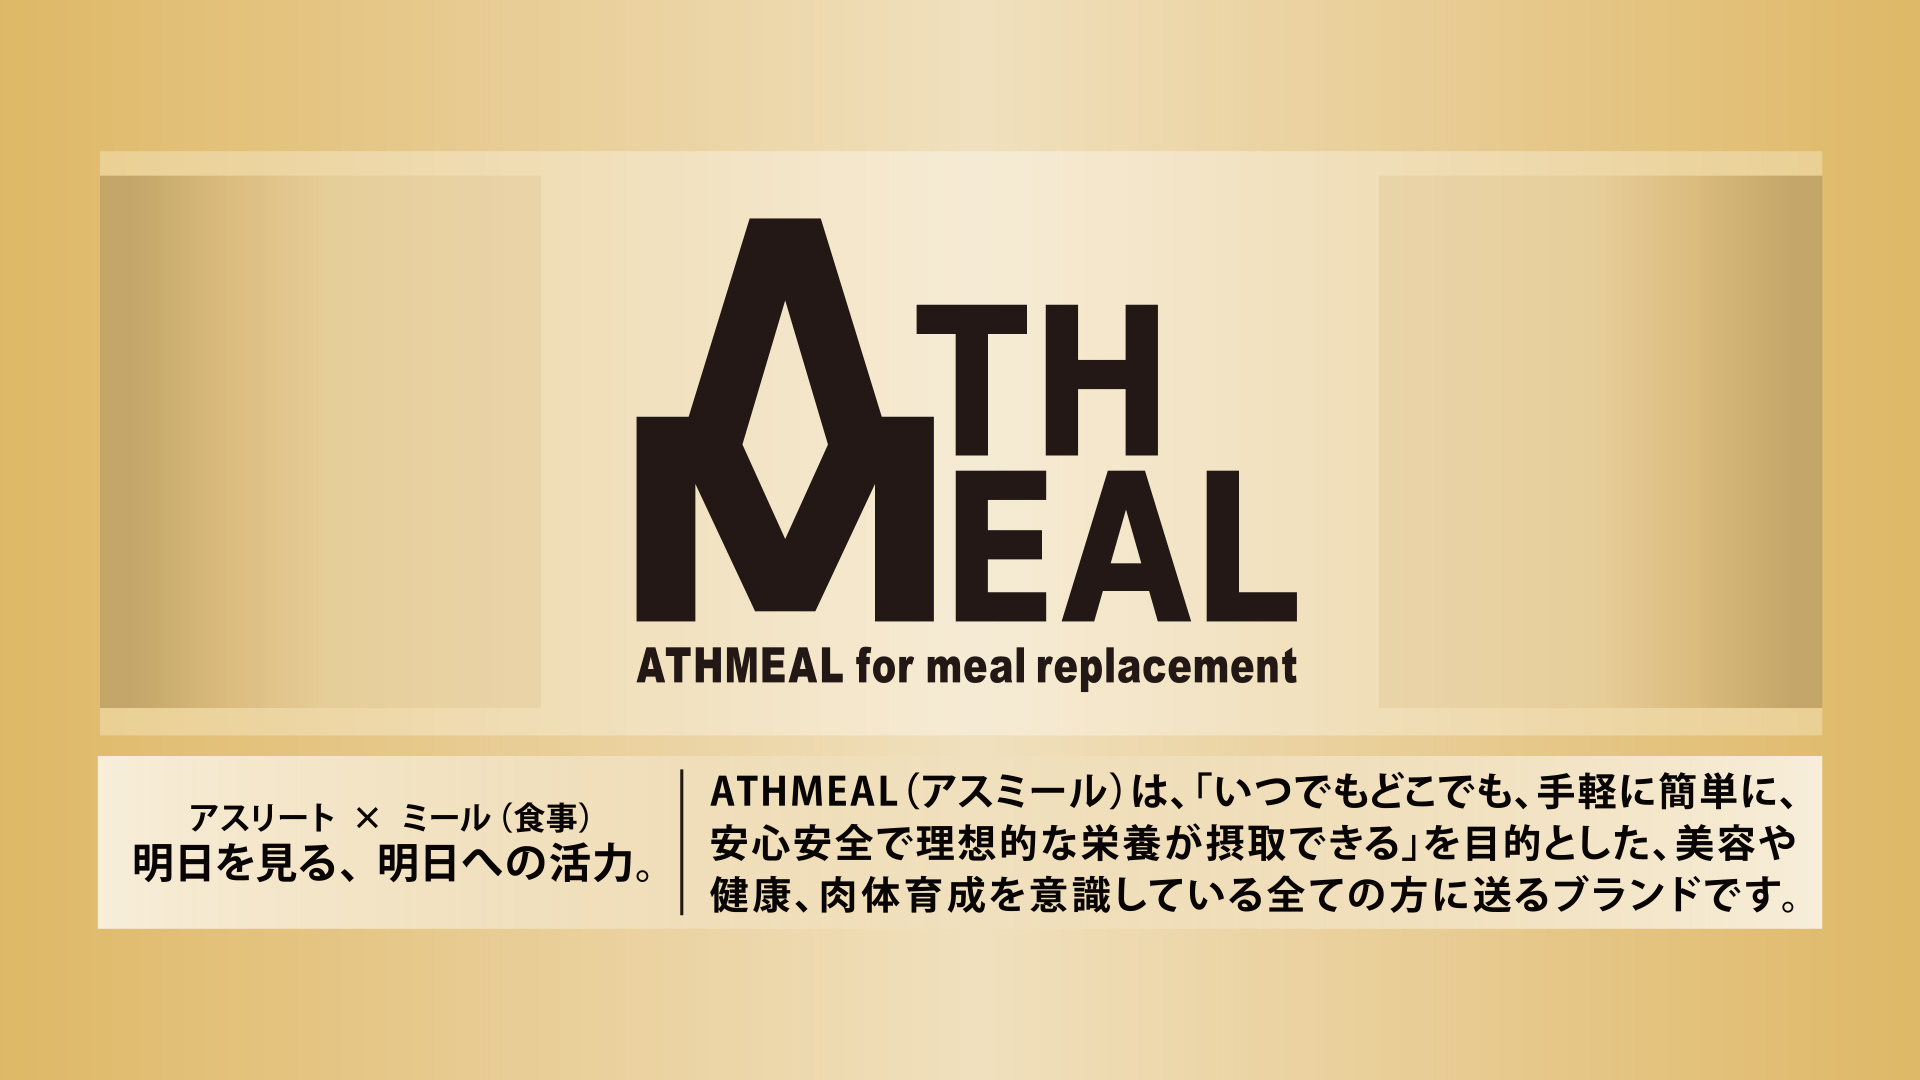 ATHMEAL